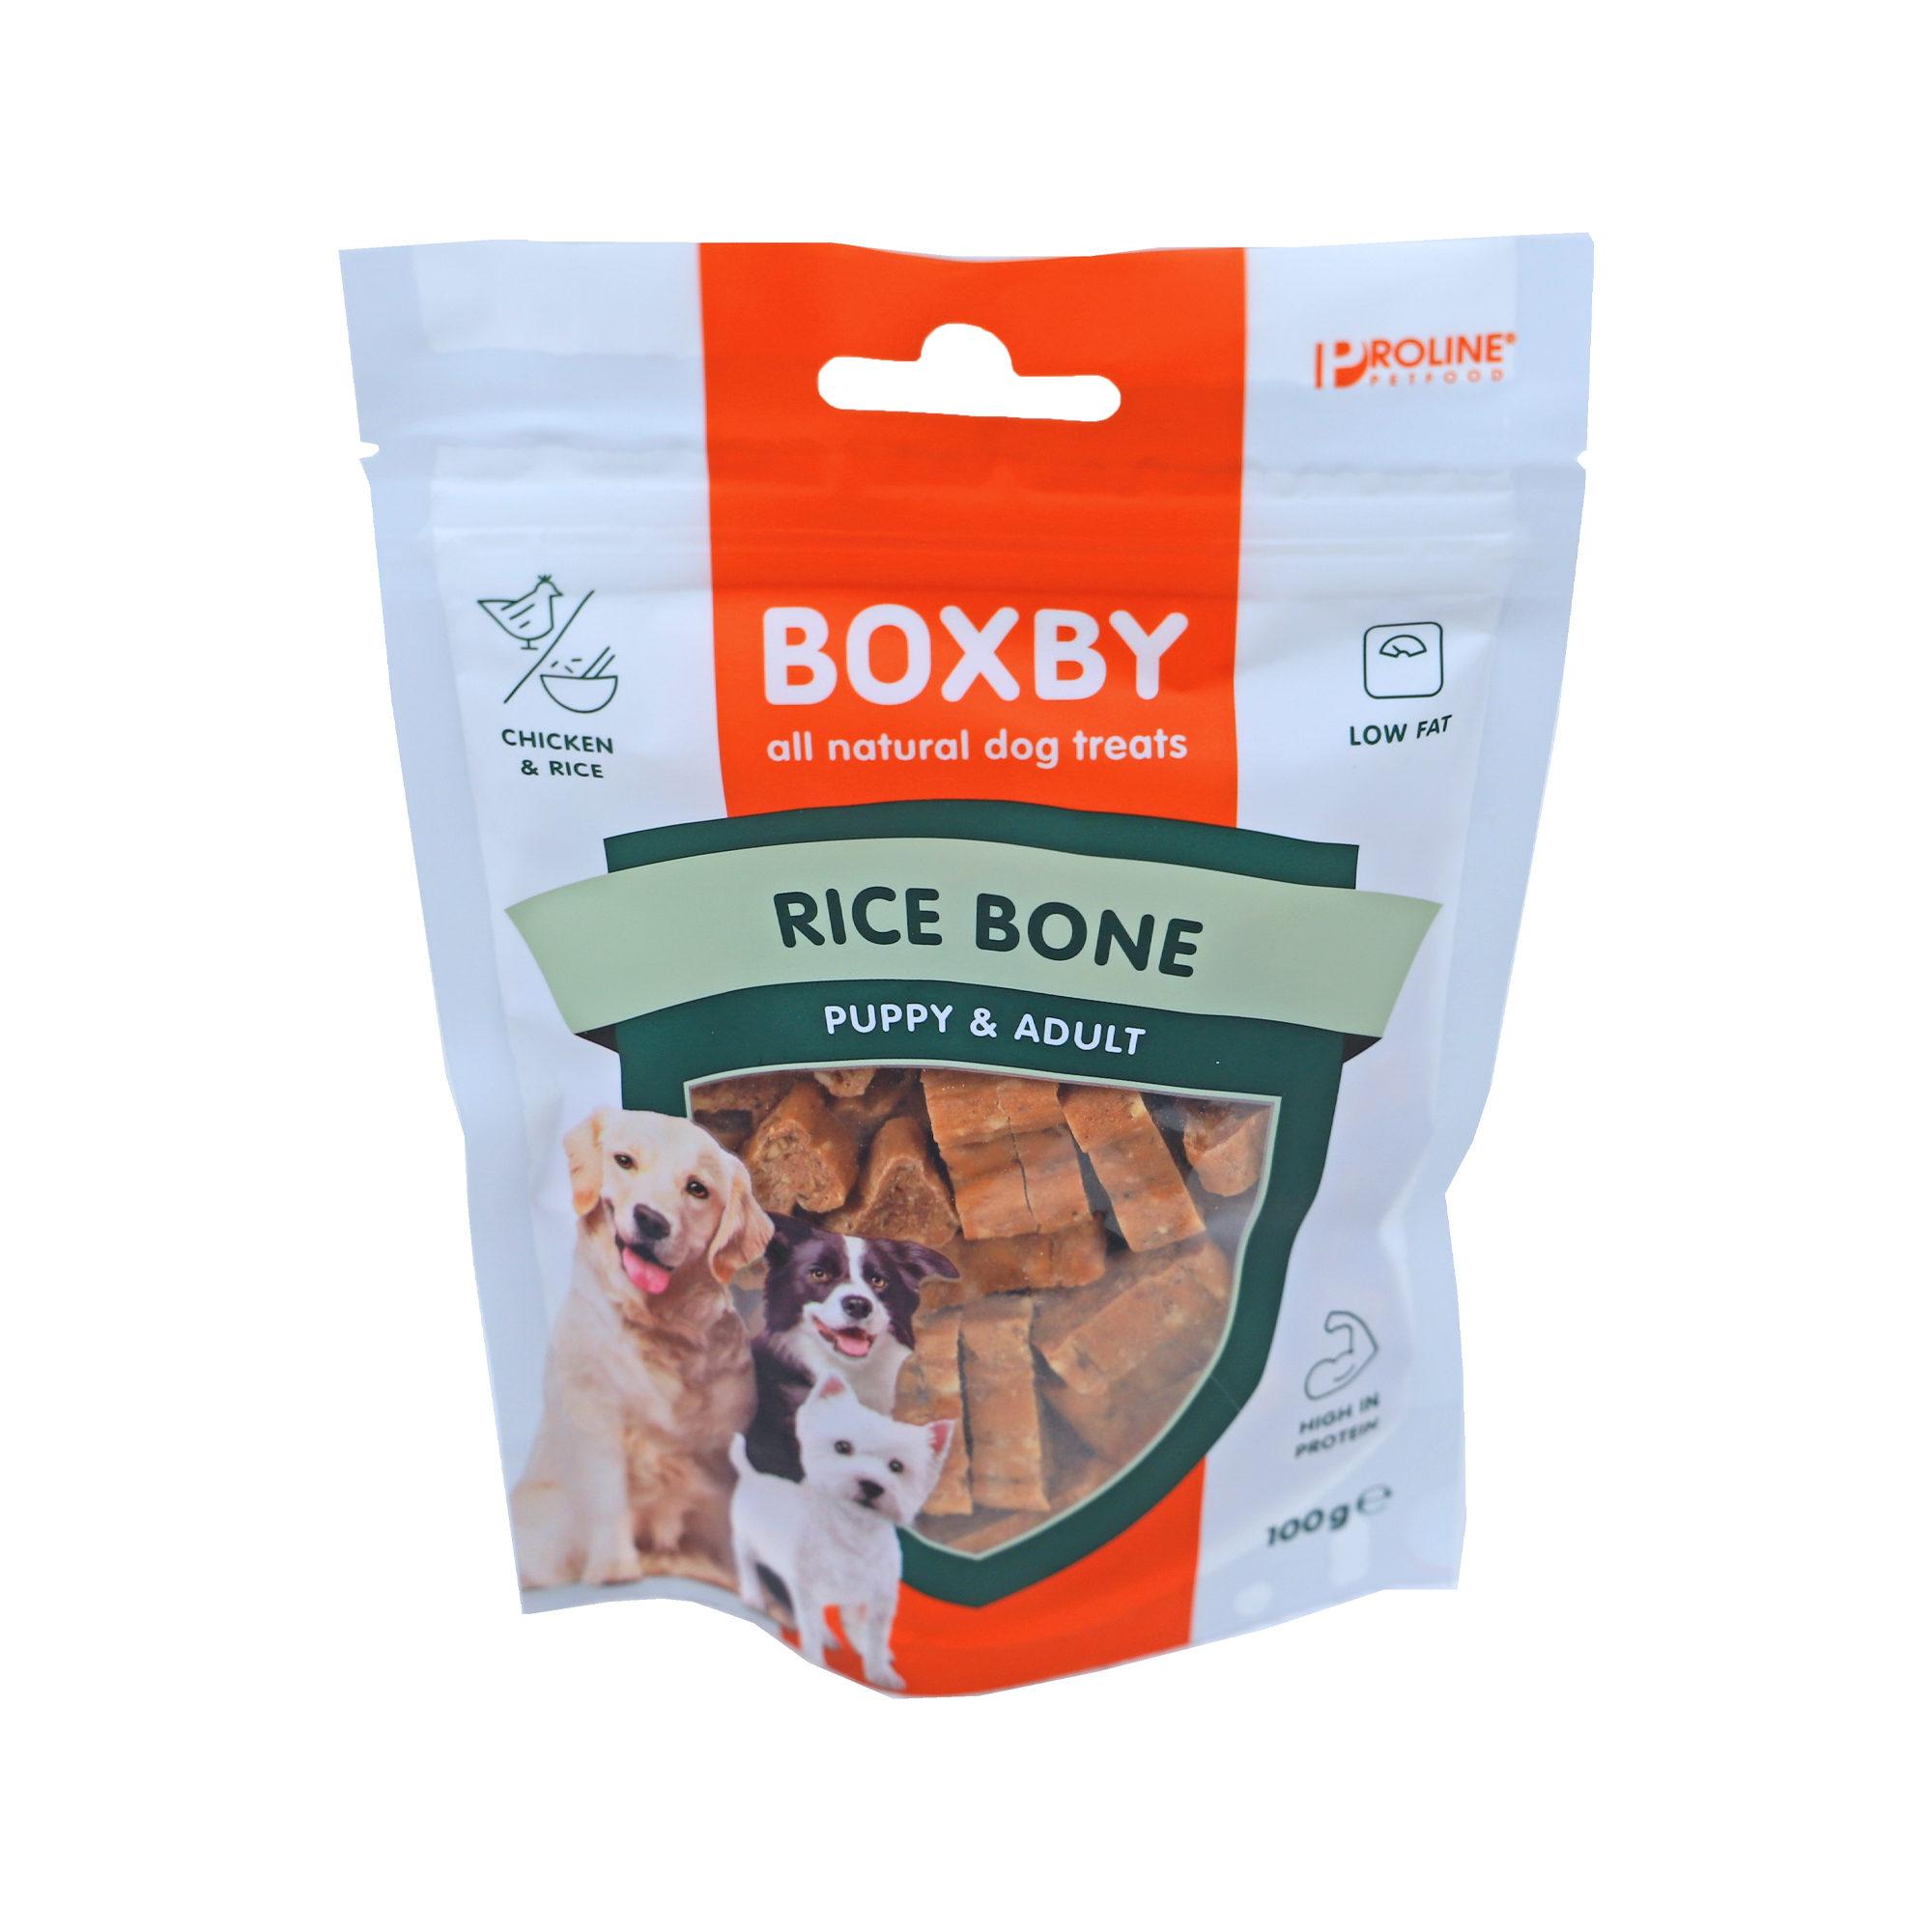 Boxby Rice Bone